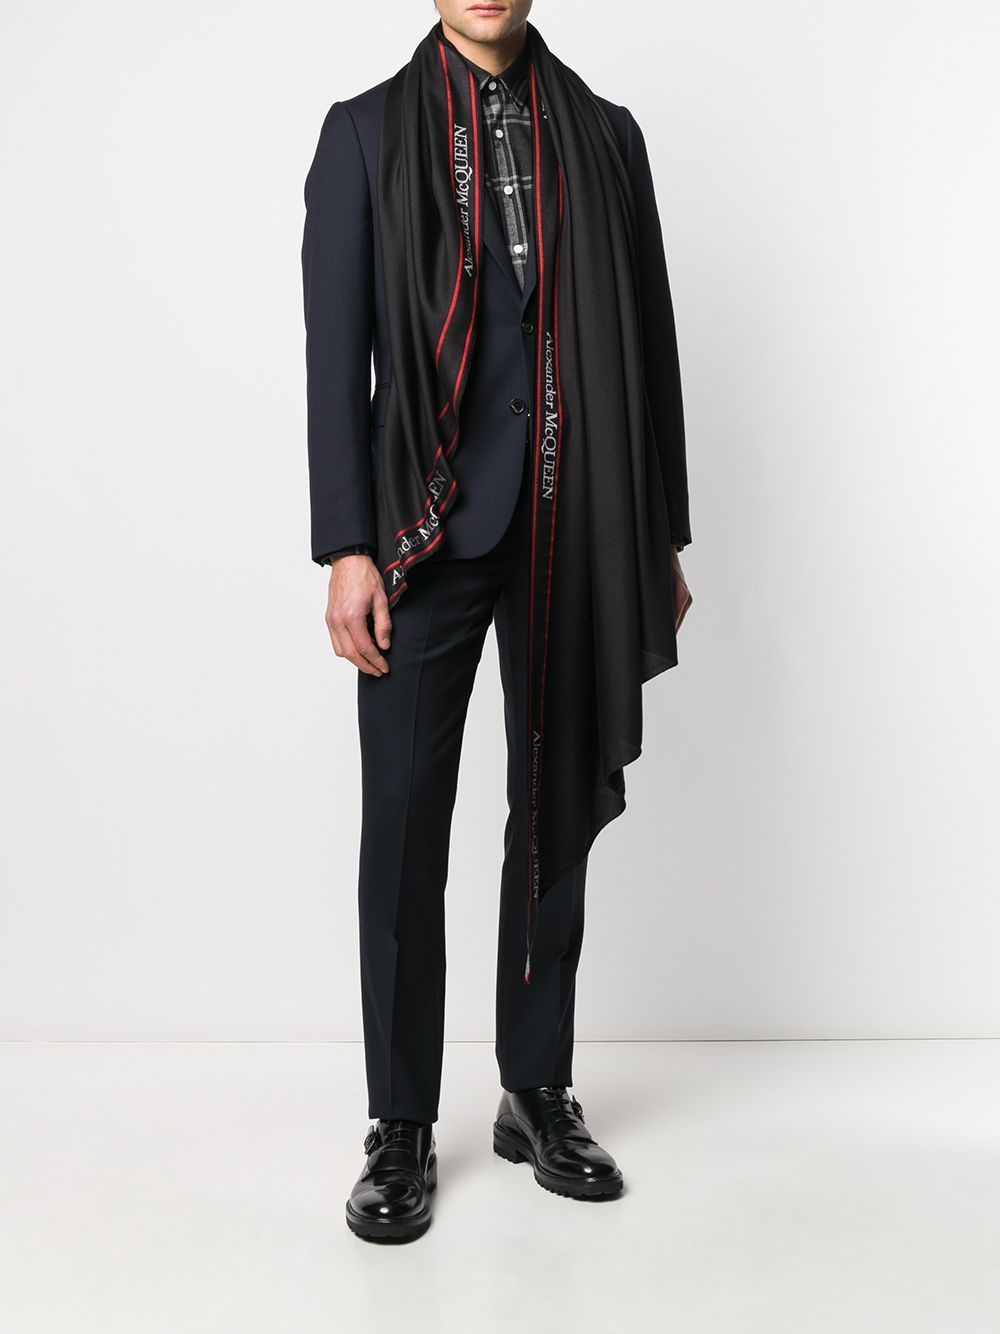 Sciarpa in misto lana con logo - Alexander Mcqueen